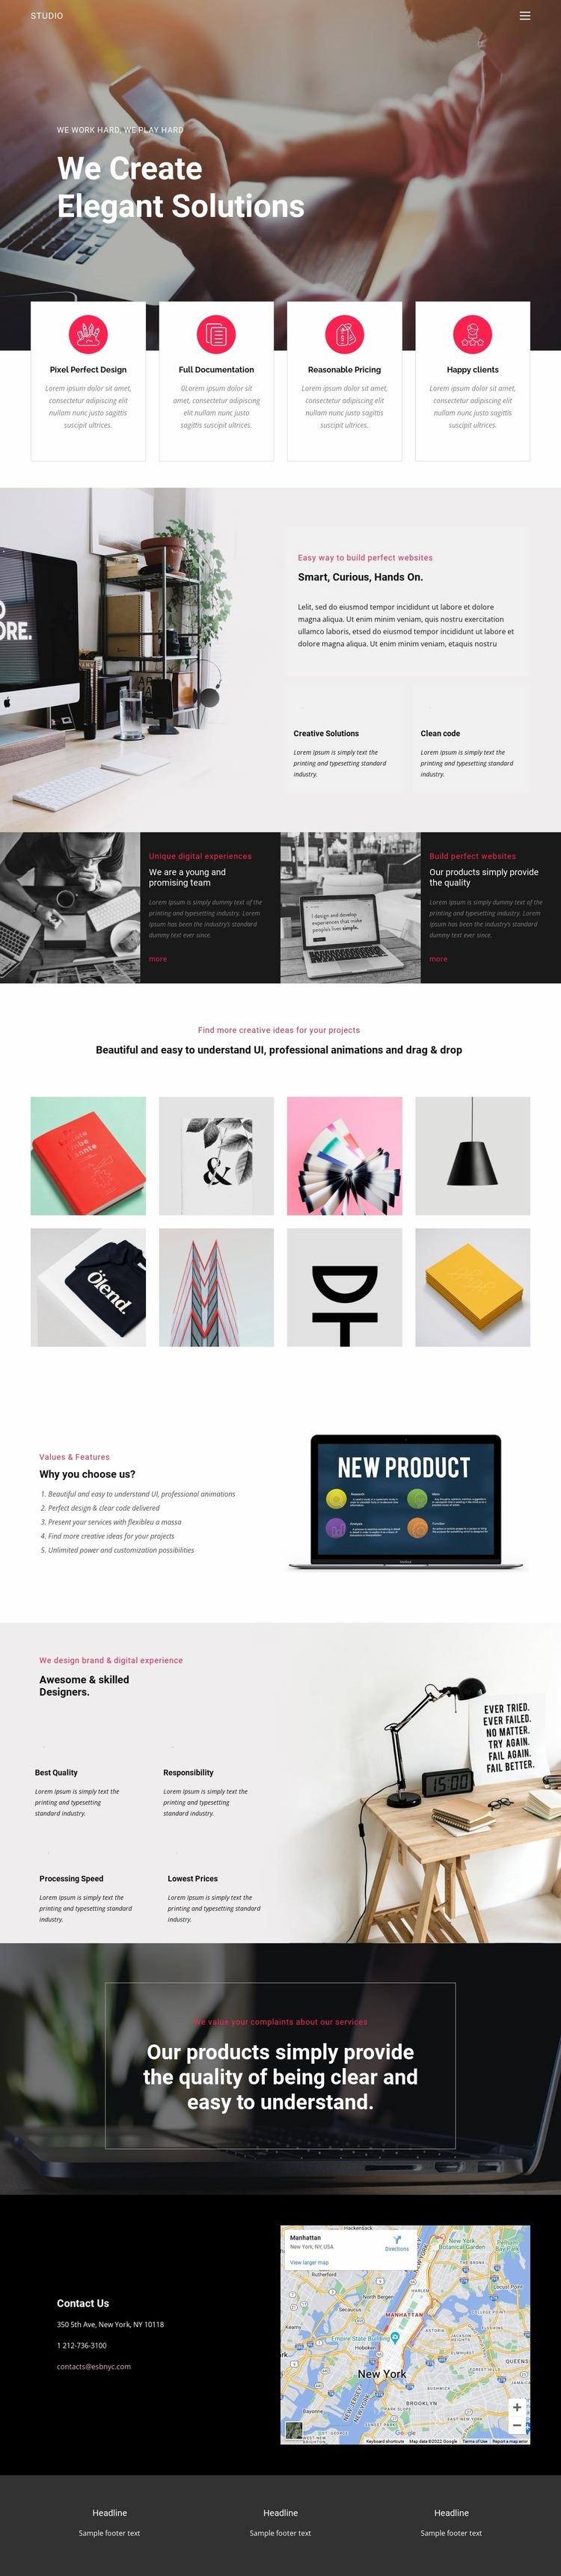 Elegant solutions in business  Website Mockup